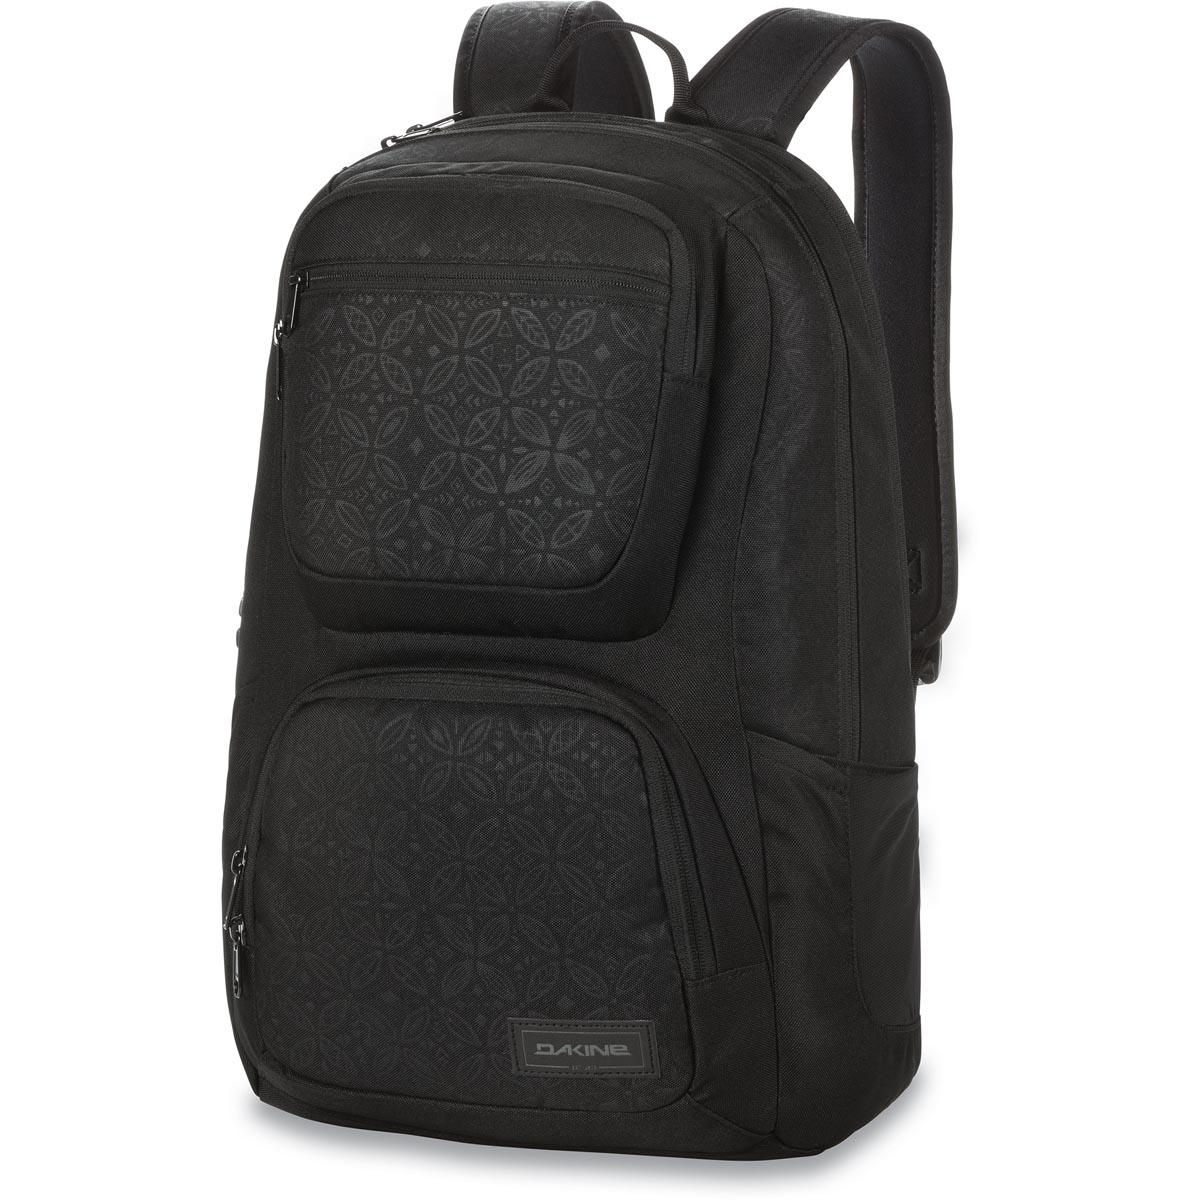 22e0db7a322ca Dakine Jewel 26L Backpack Tory